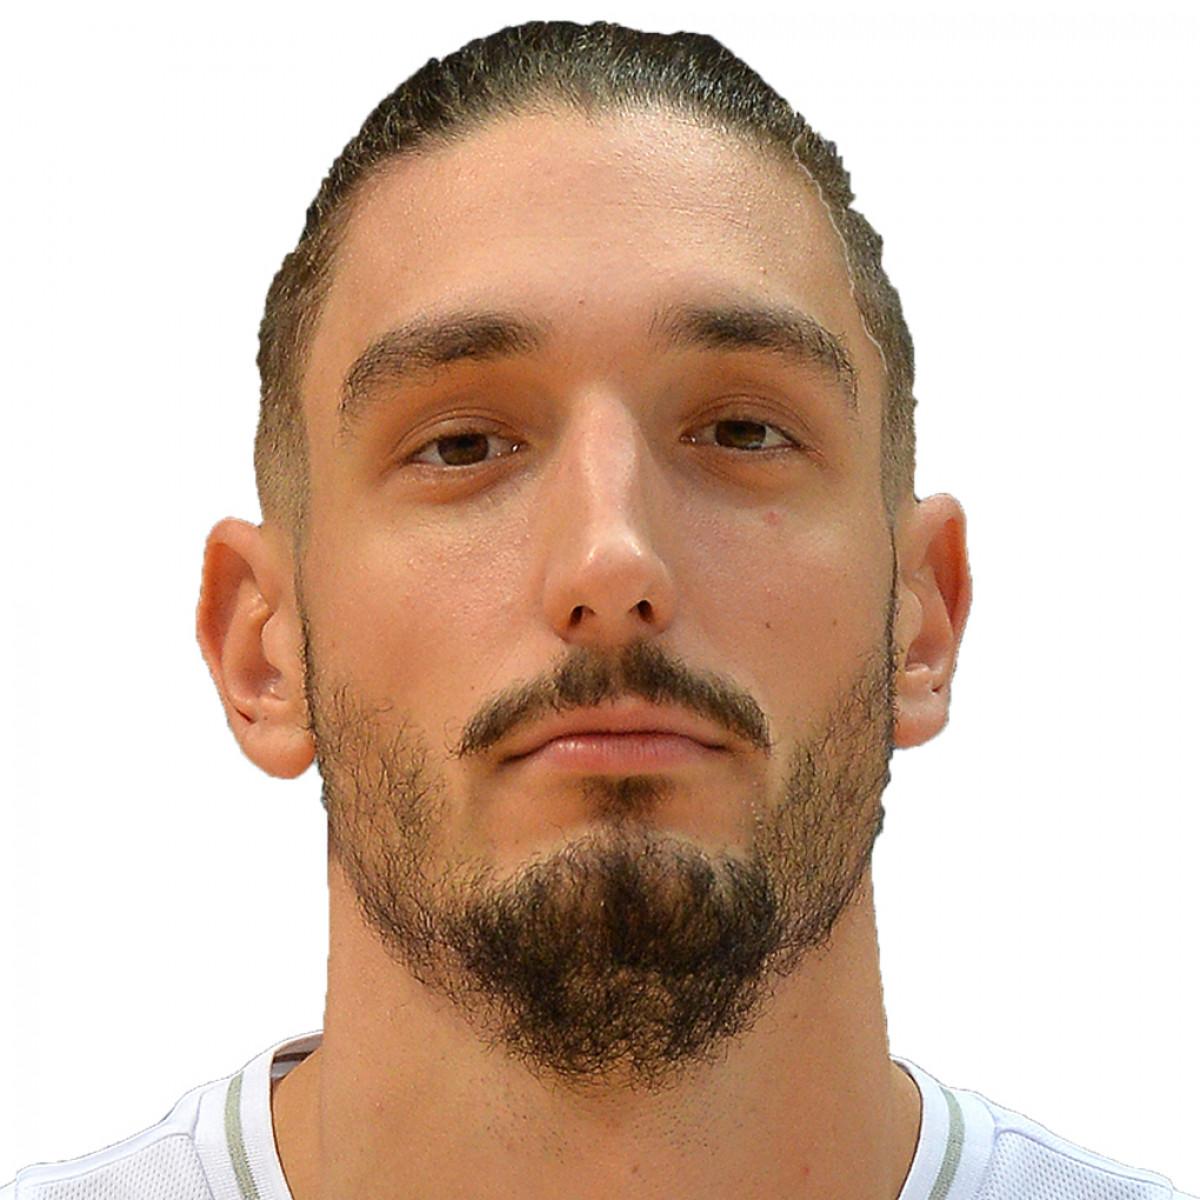 Domagoj Vukovic